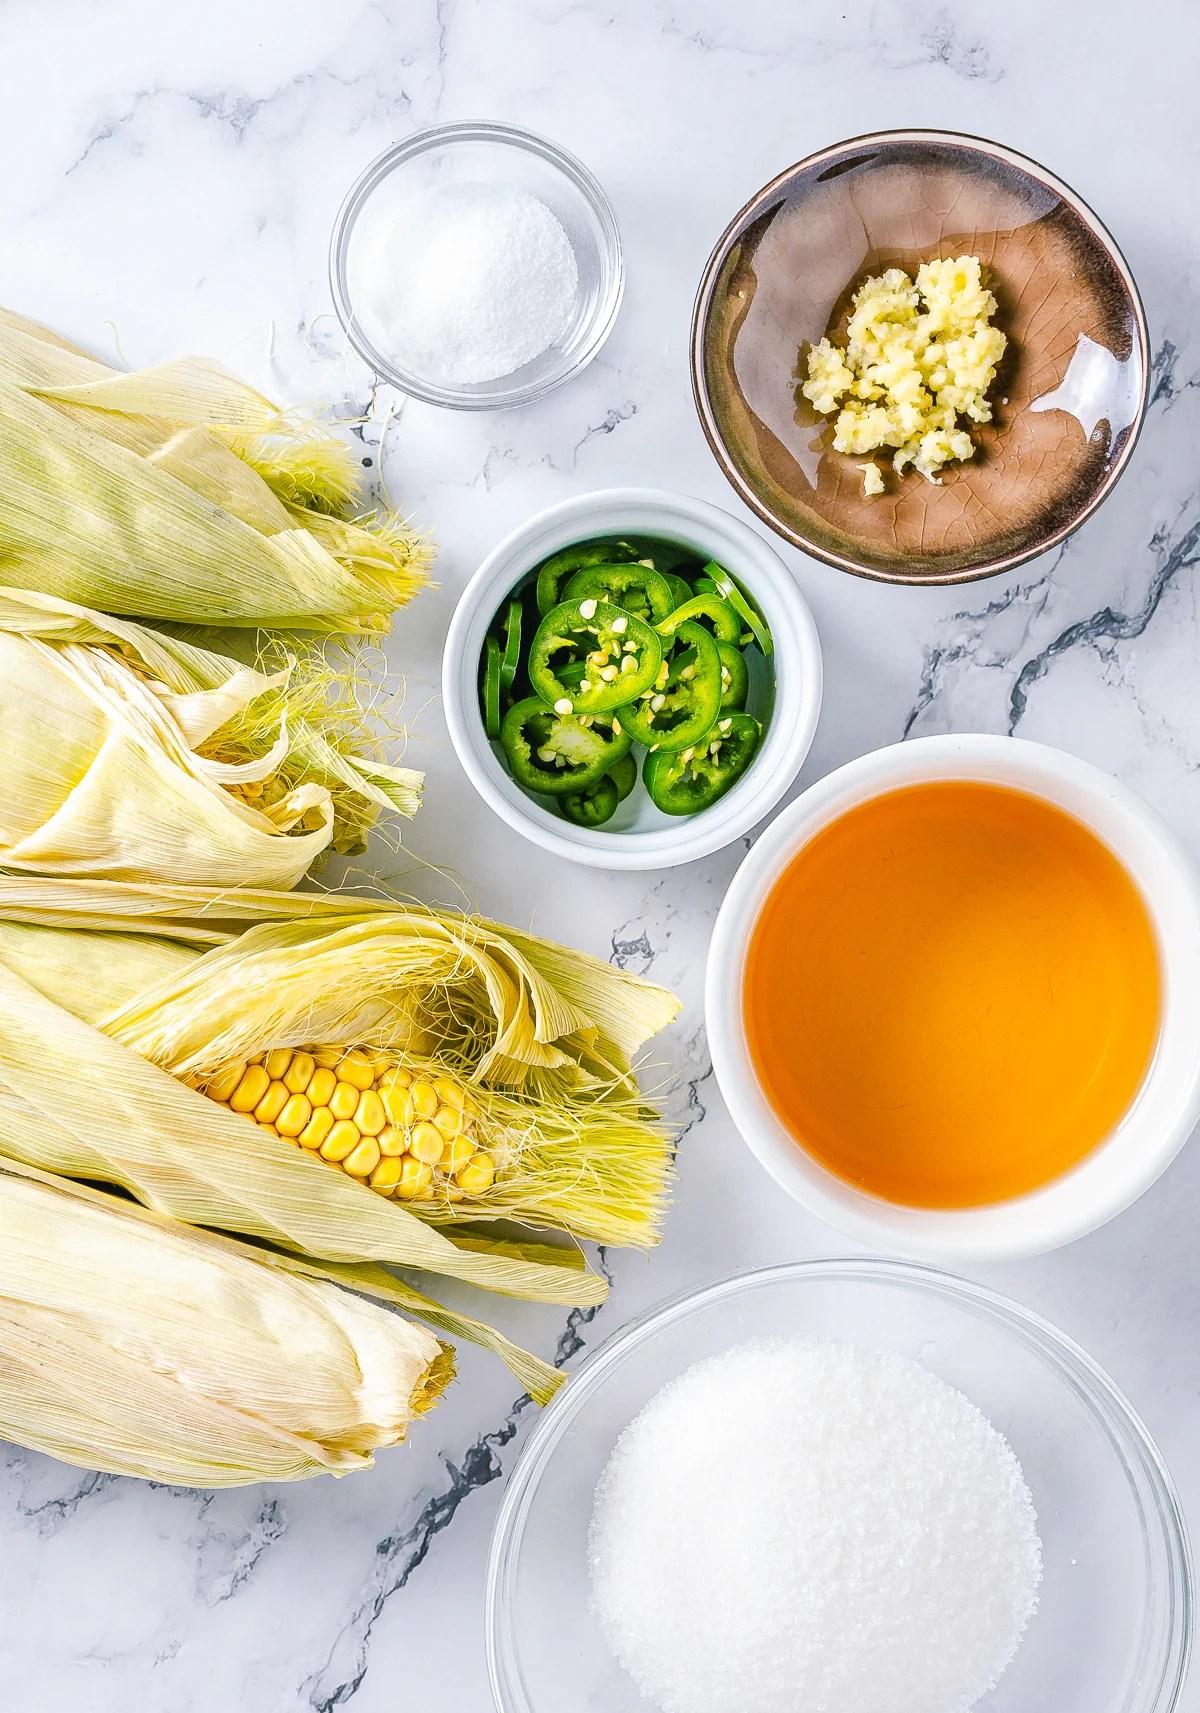 Ingredients needed to make Corn Relish